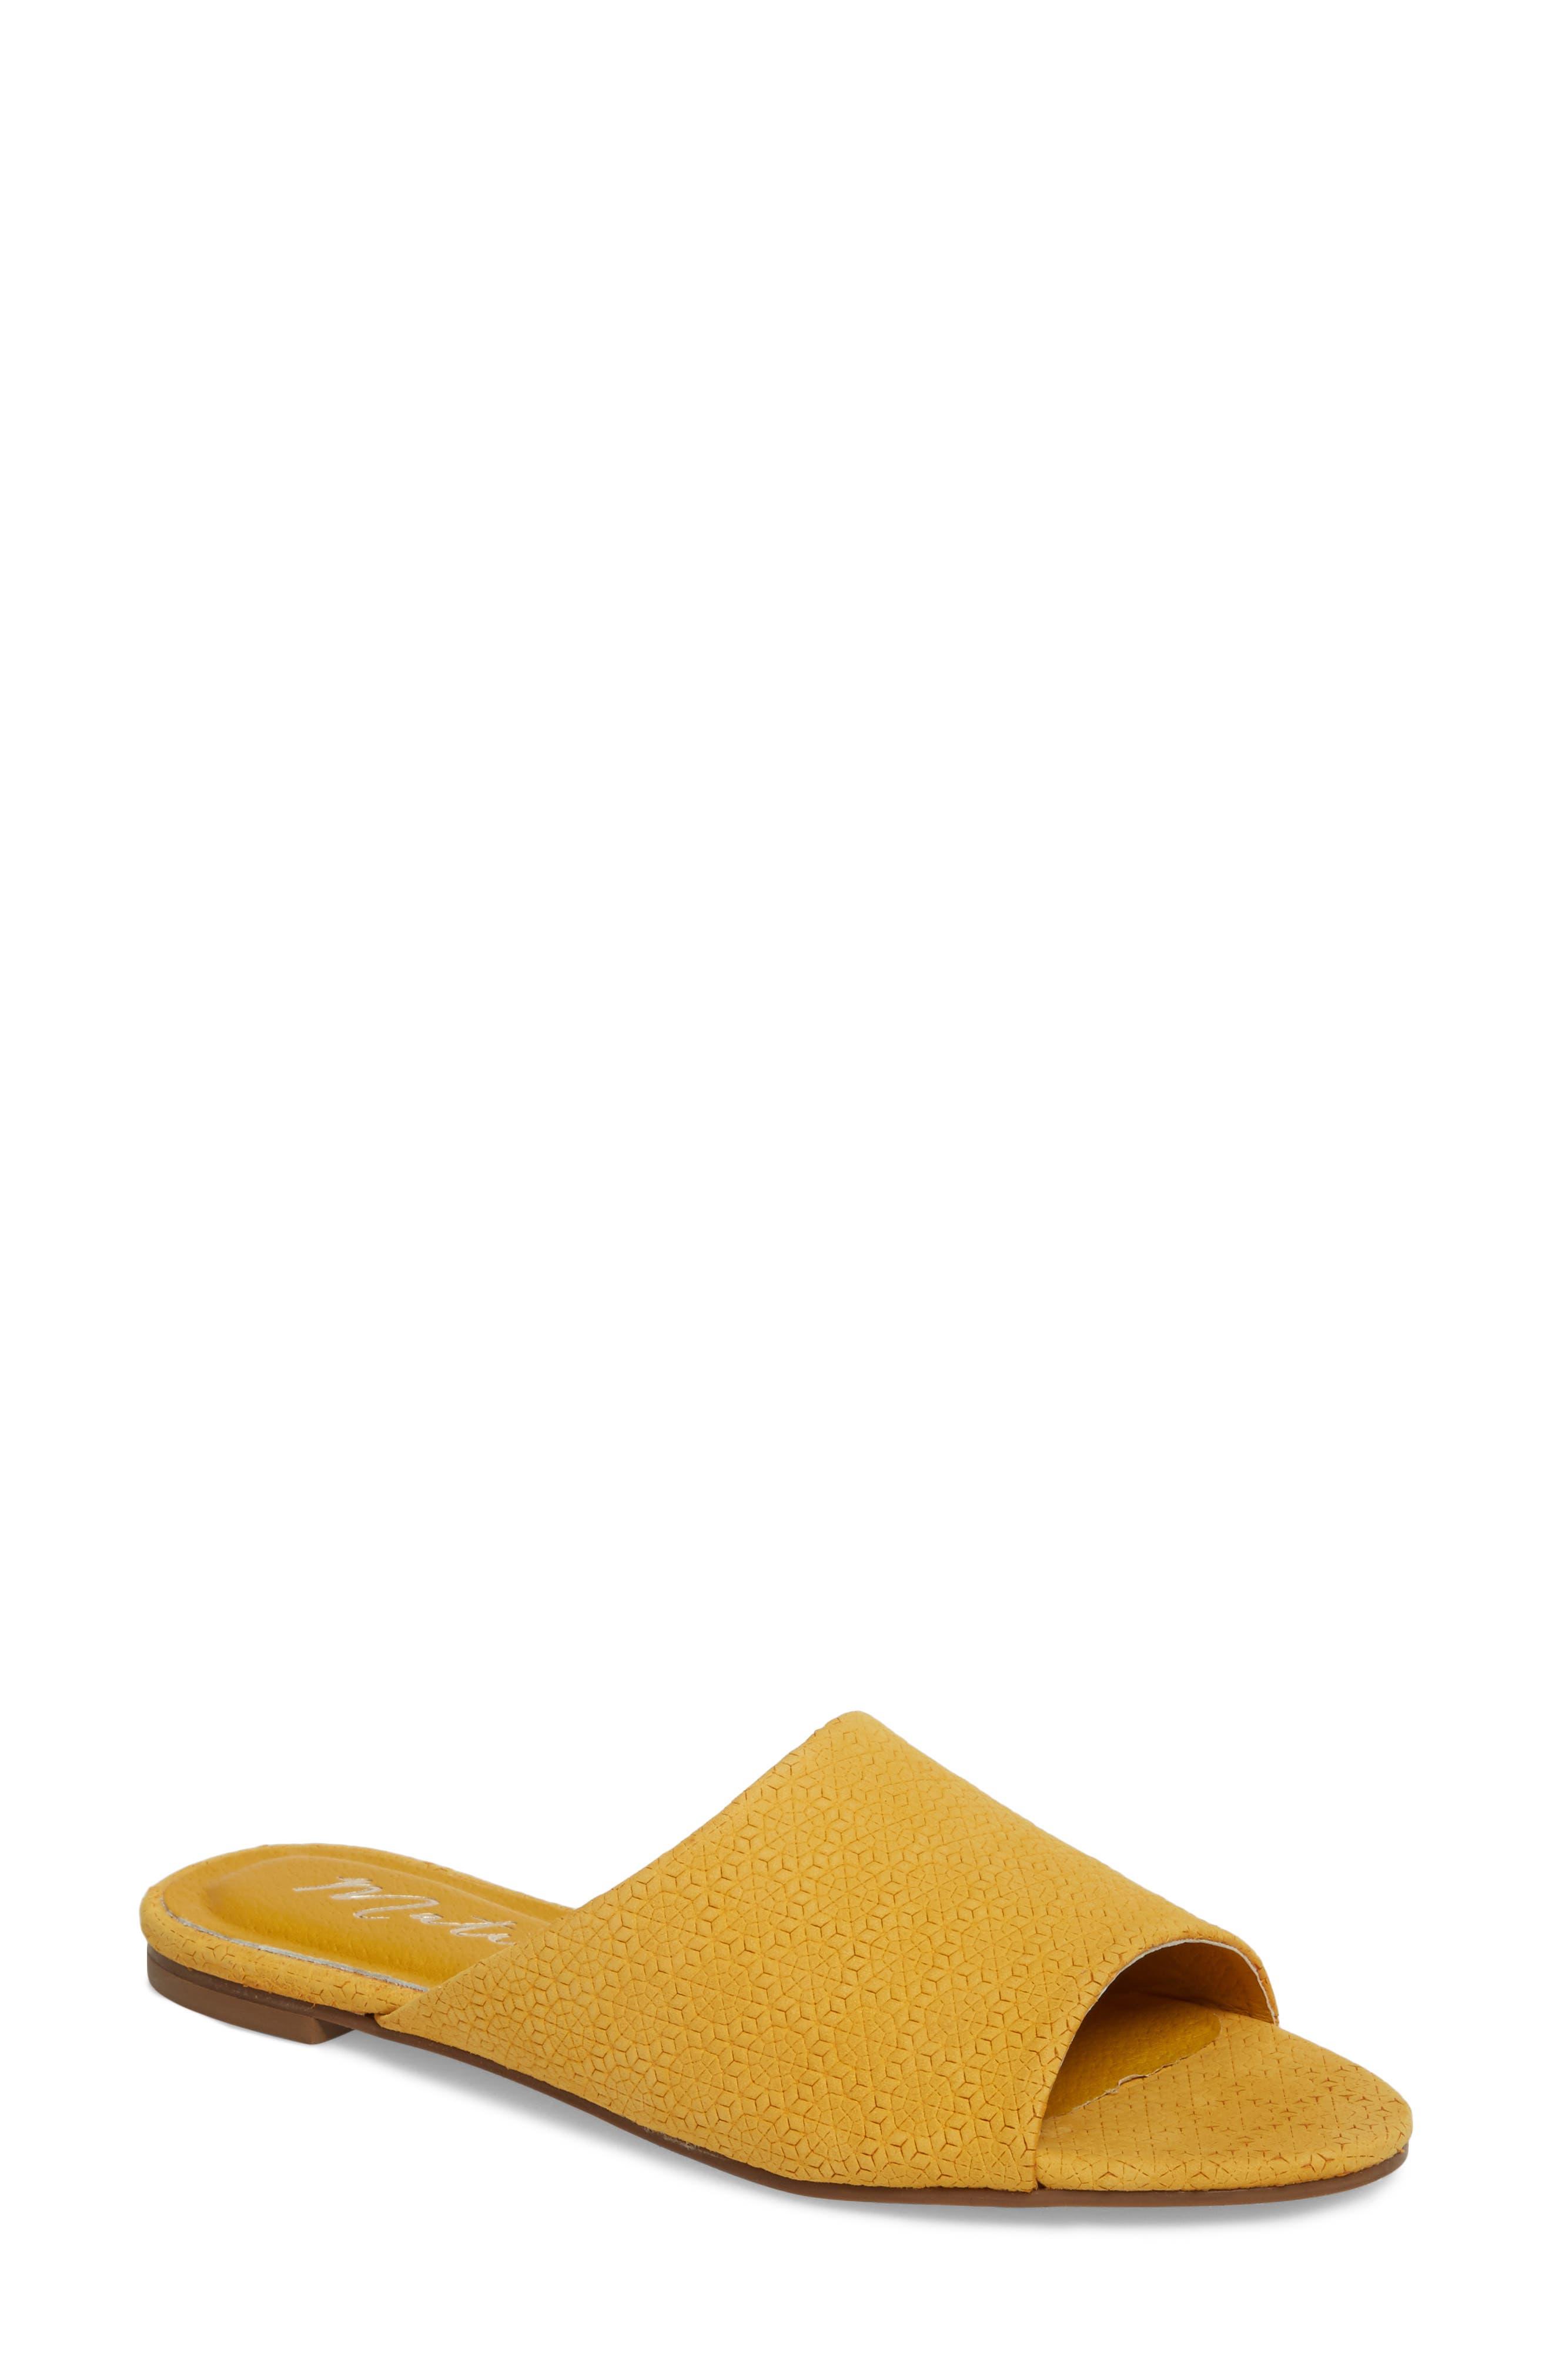 Lira Sandal,                         Main,                         color, Mango Leather